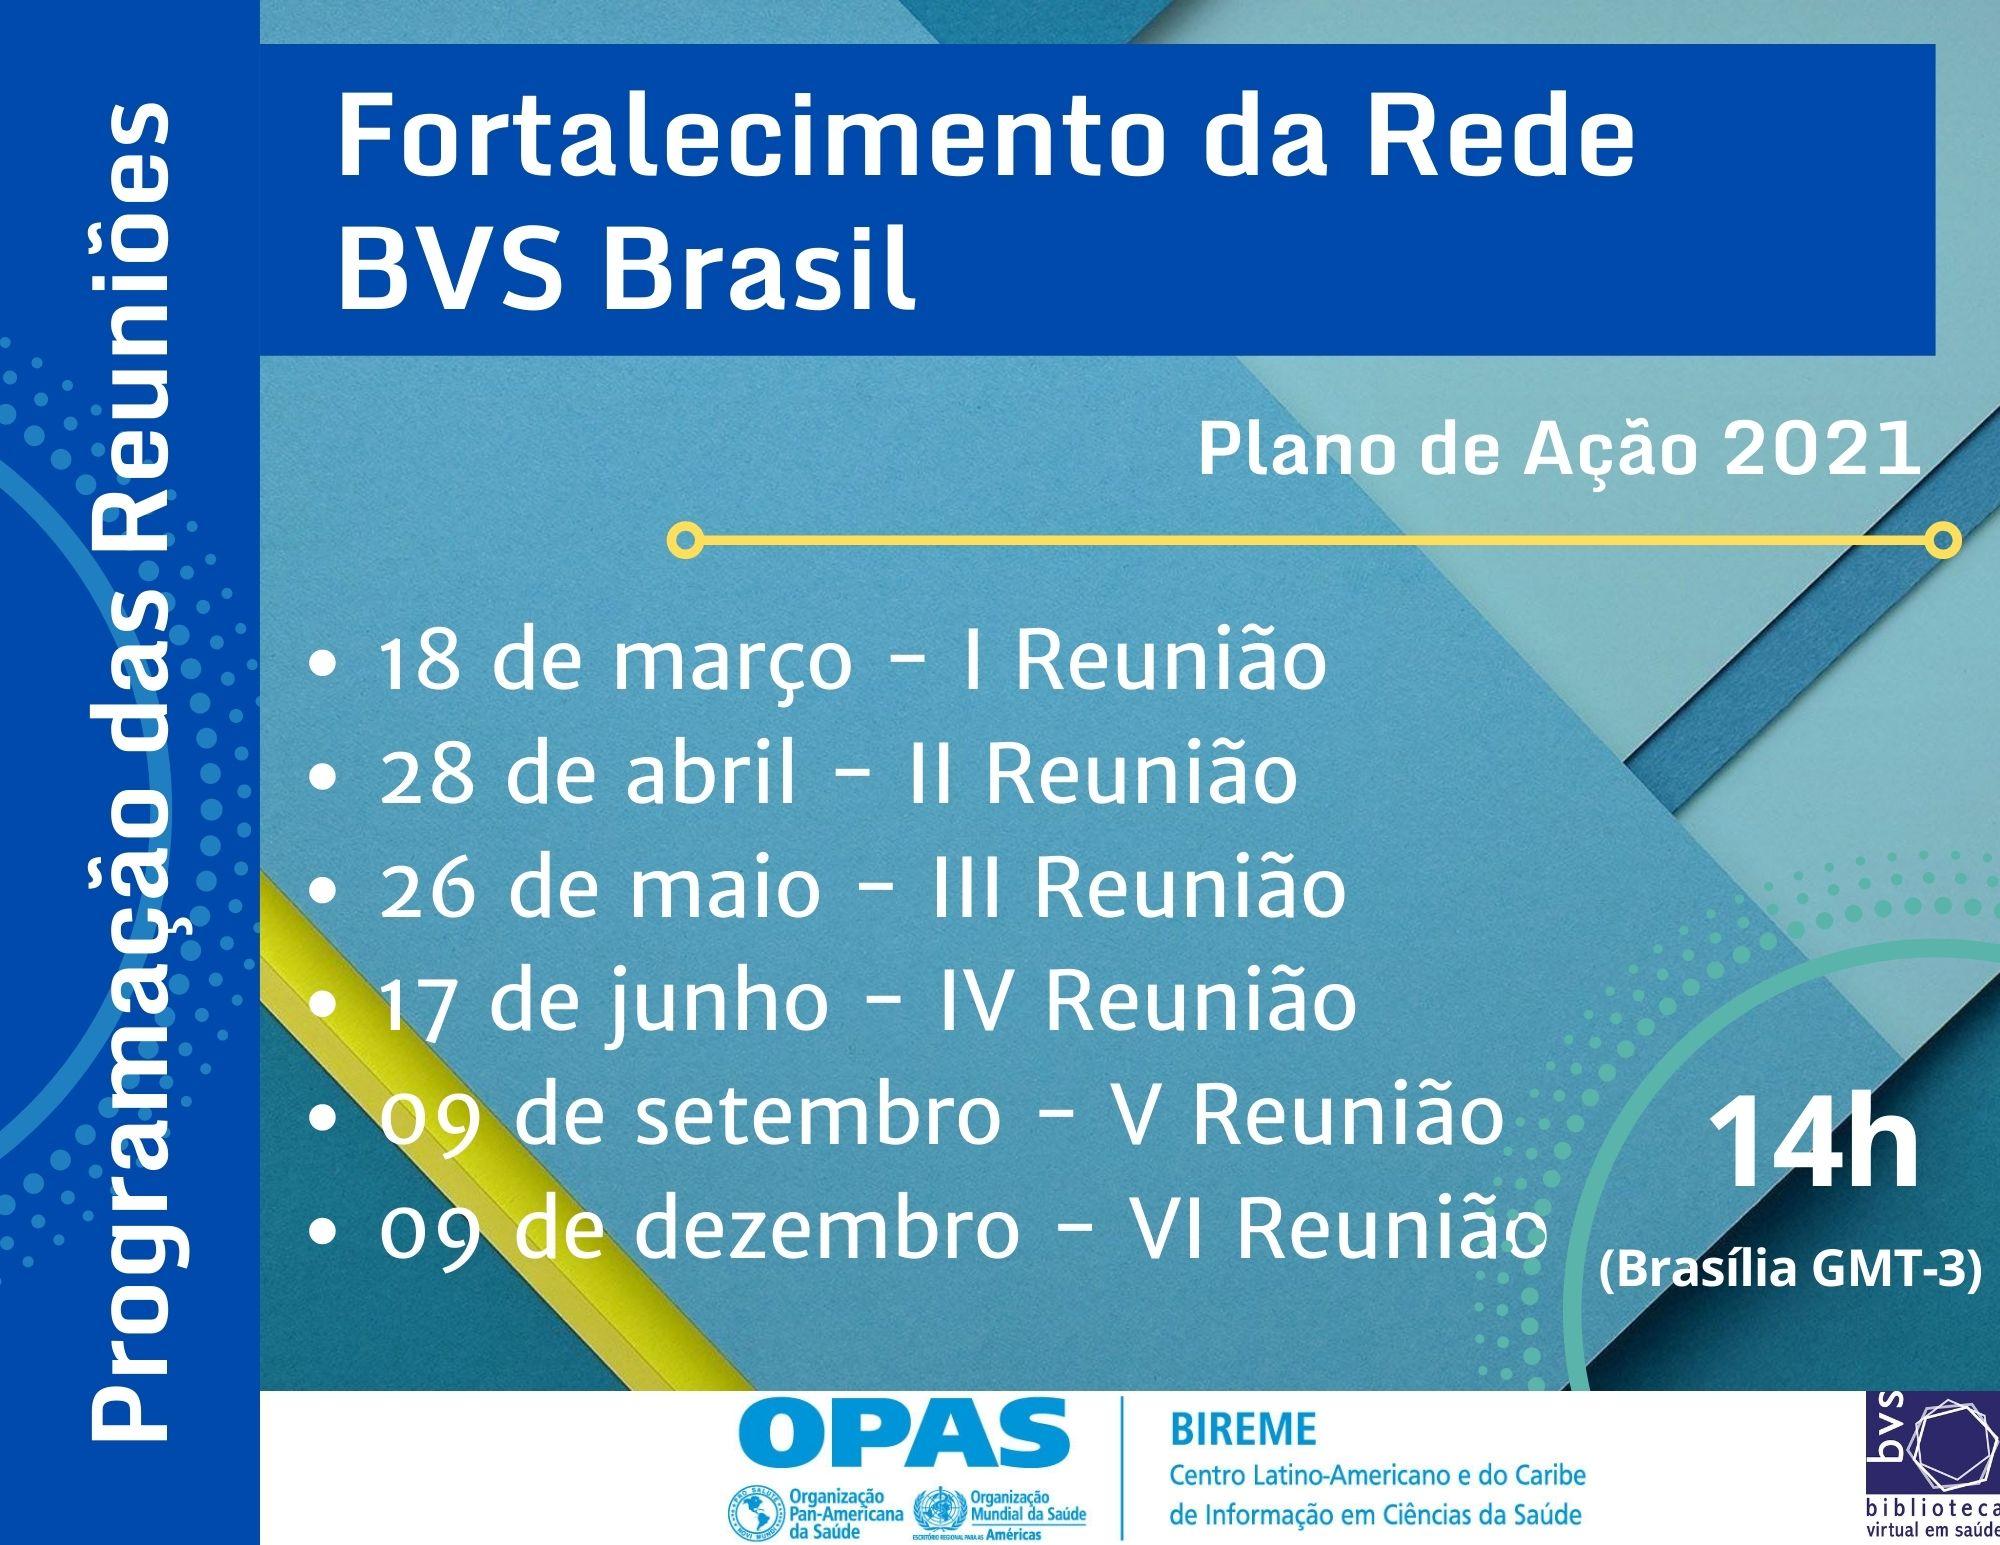 Programacao-Plano-acao-2021-Rede-BVS-Brasil